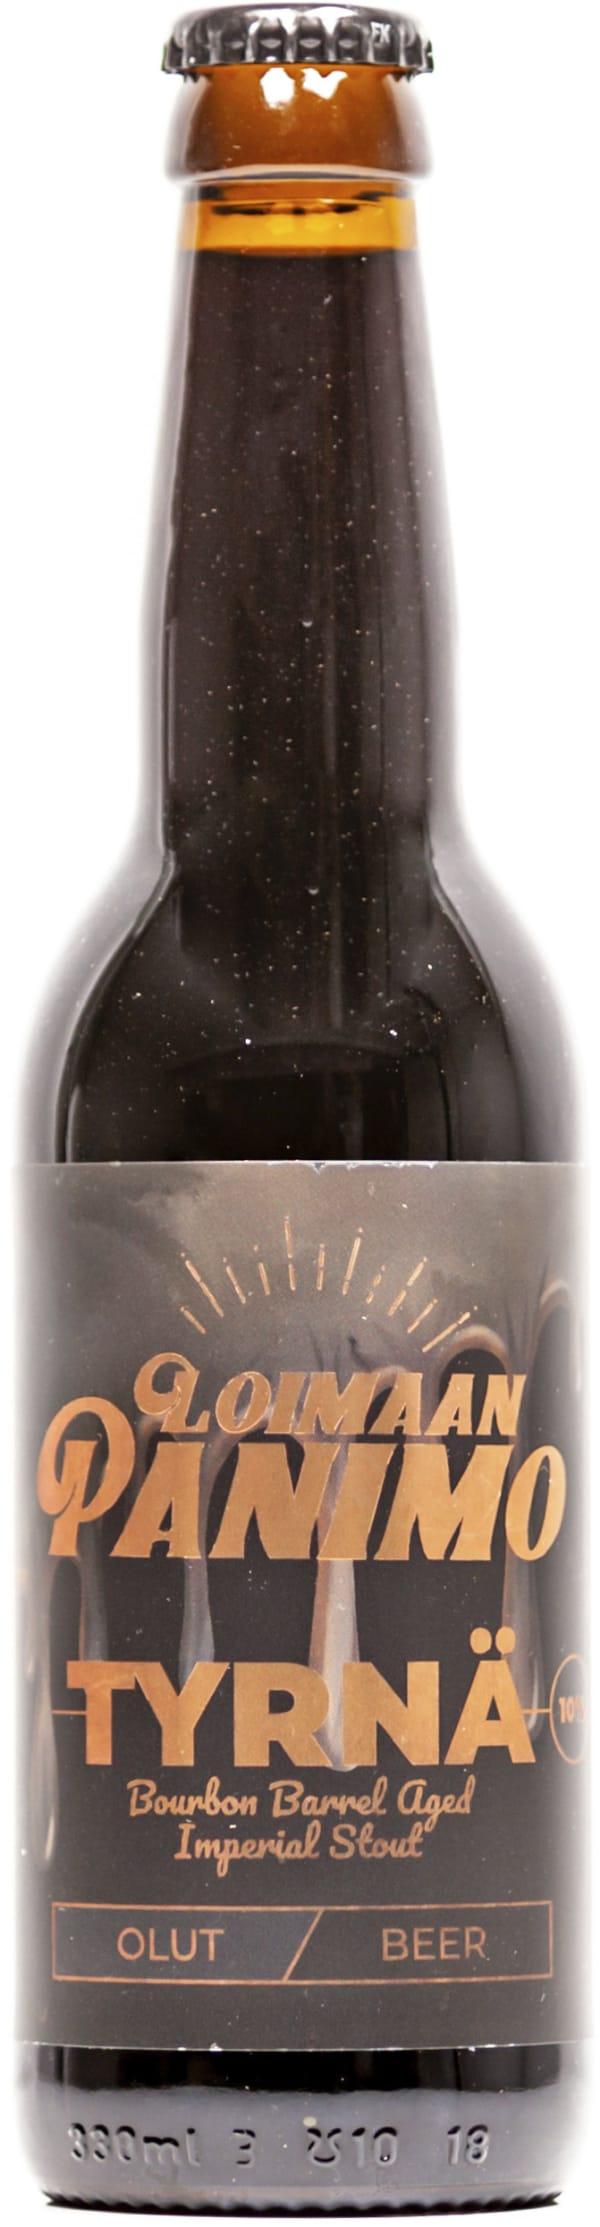 Loimaan Tyrnä Bourbon Barrel Aged Imperial Stout